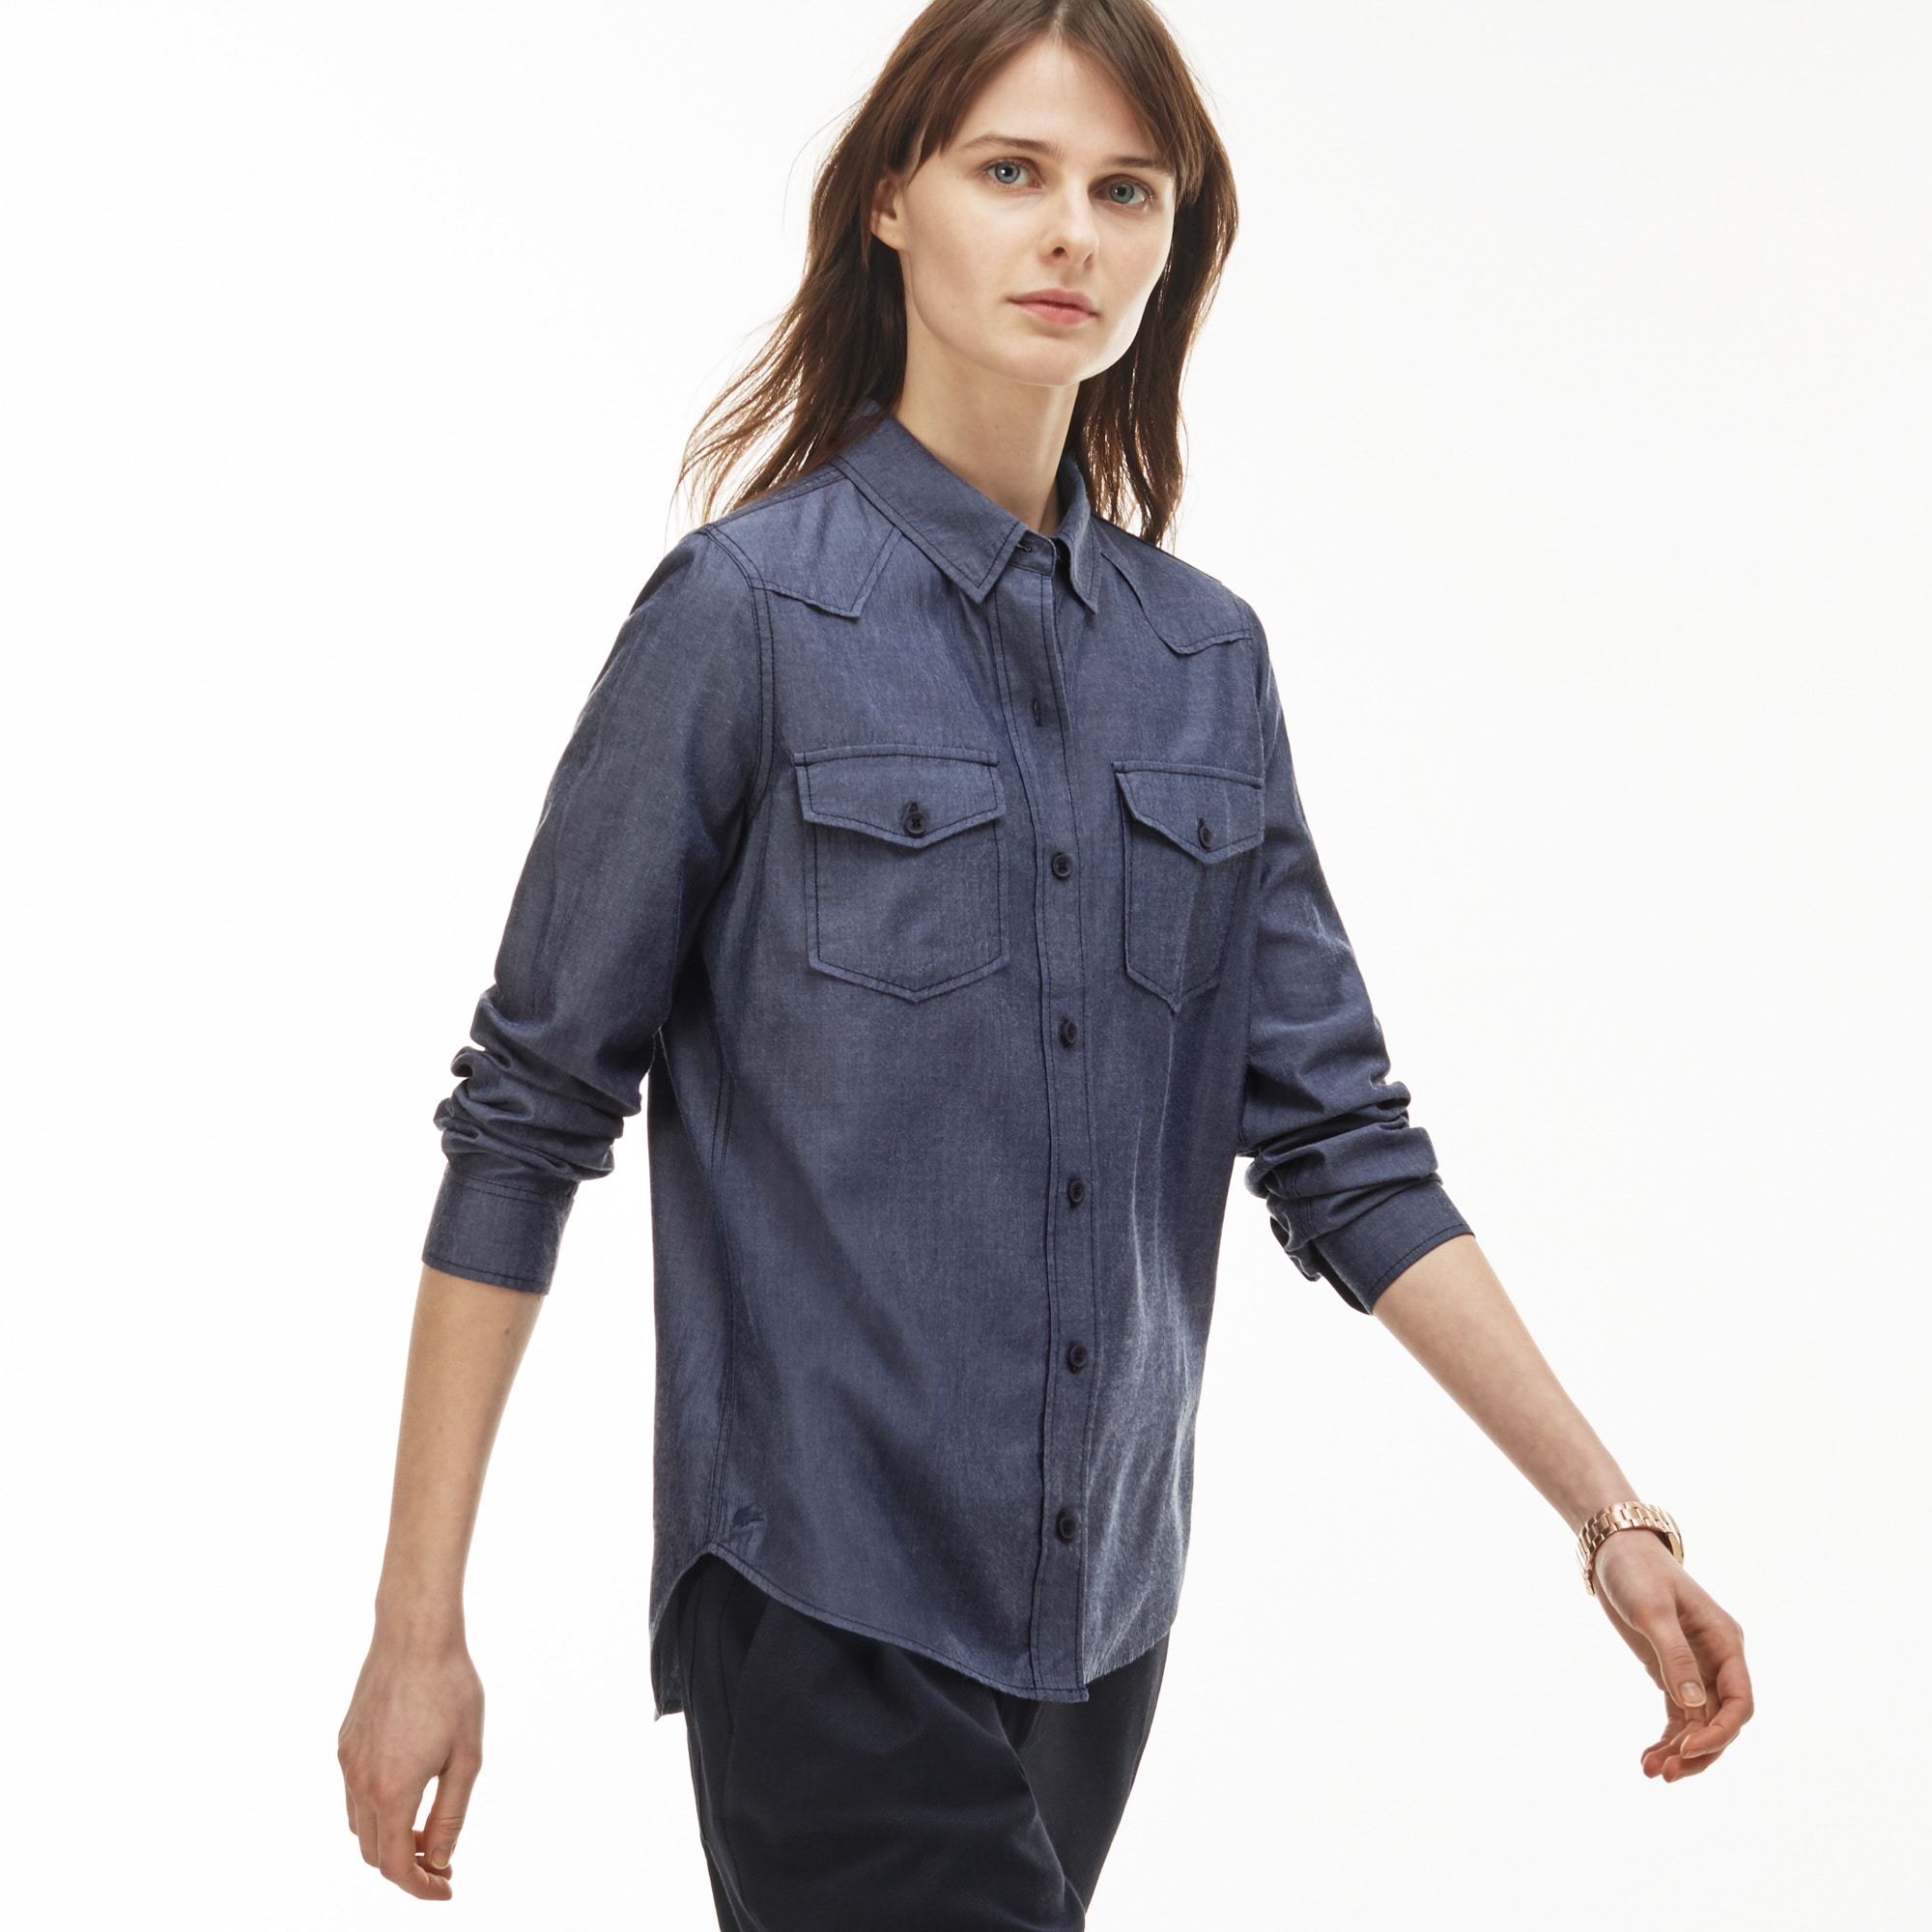 Women's Slim Fit Denim Effect Cotton Chambray Shirt